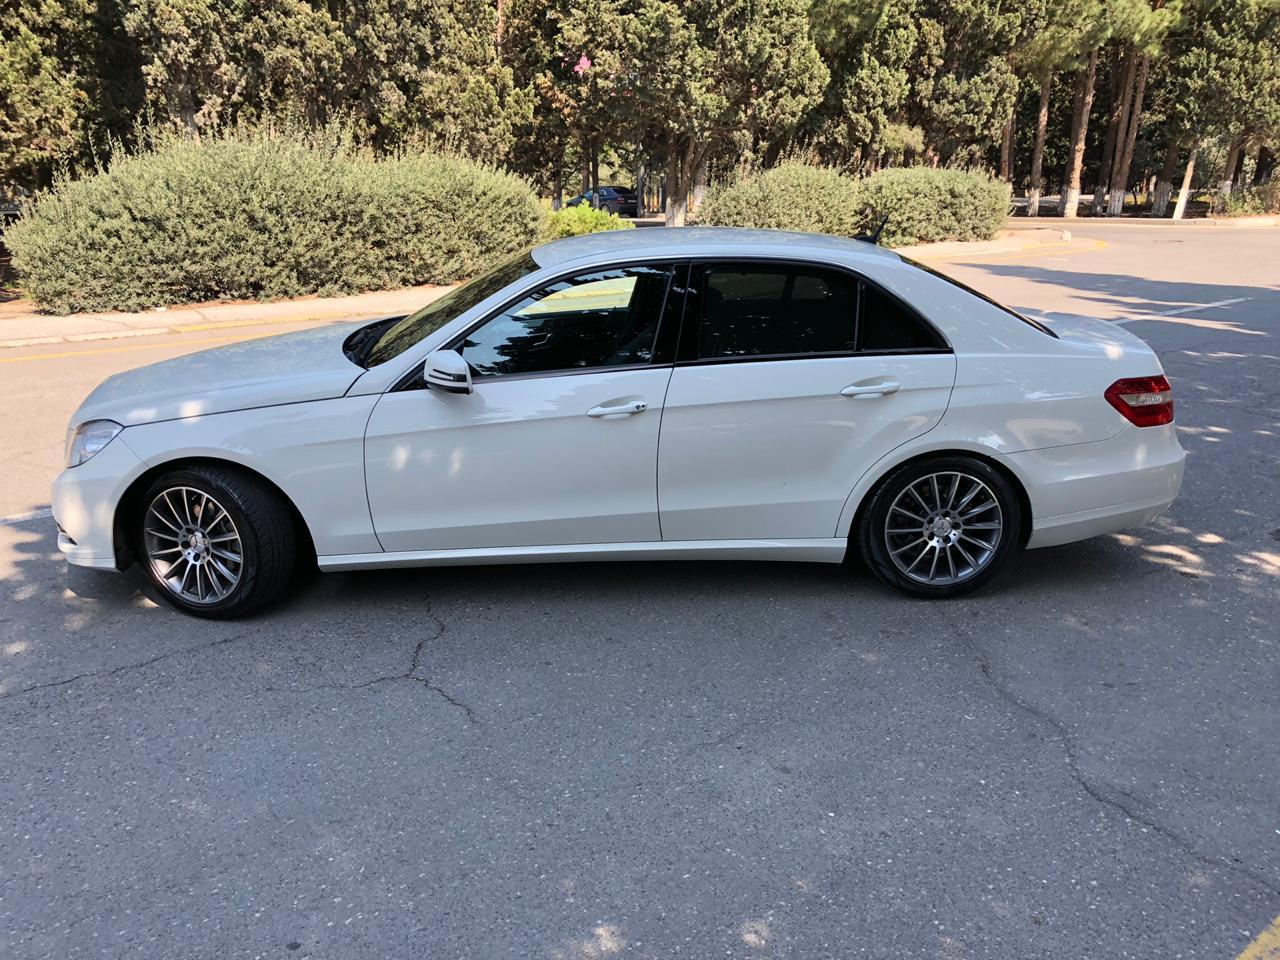 Mercedes-Benz E 220 2.2(lt) 2009 İkinci əl  $18000